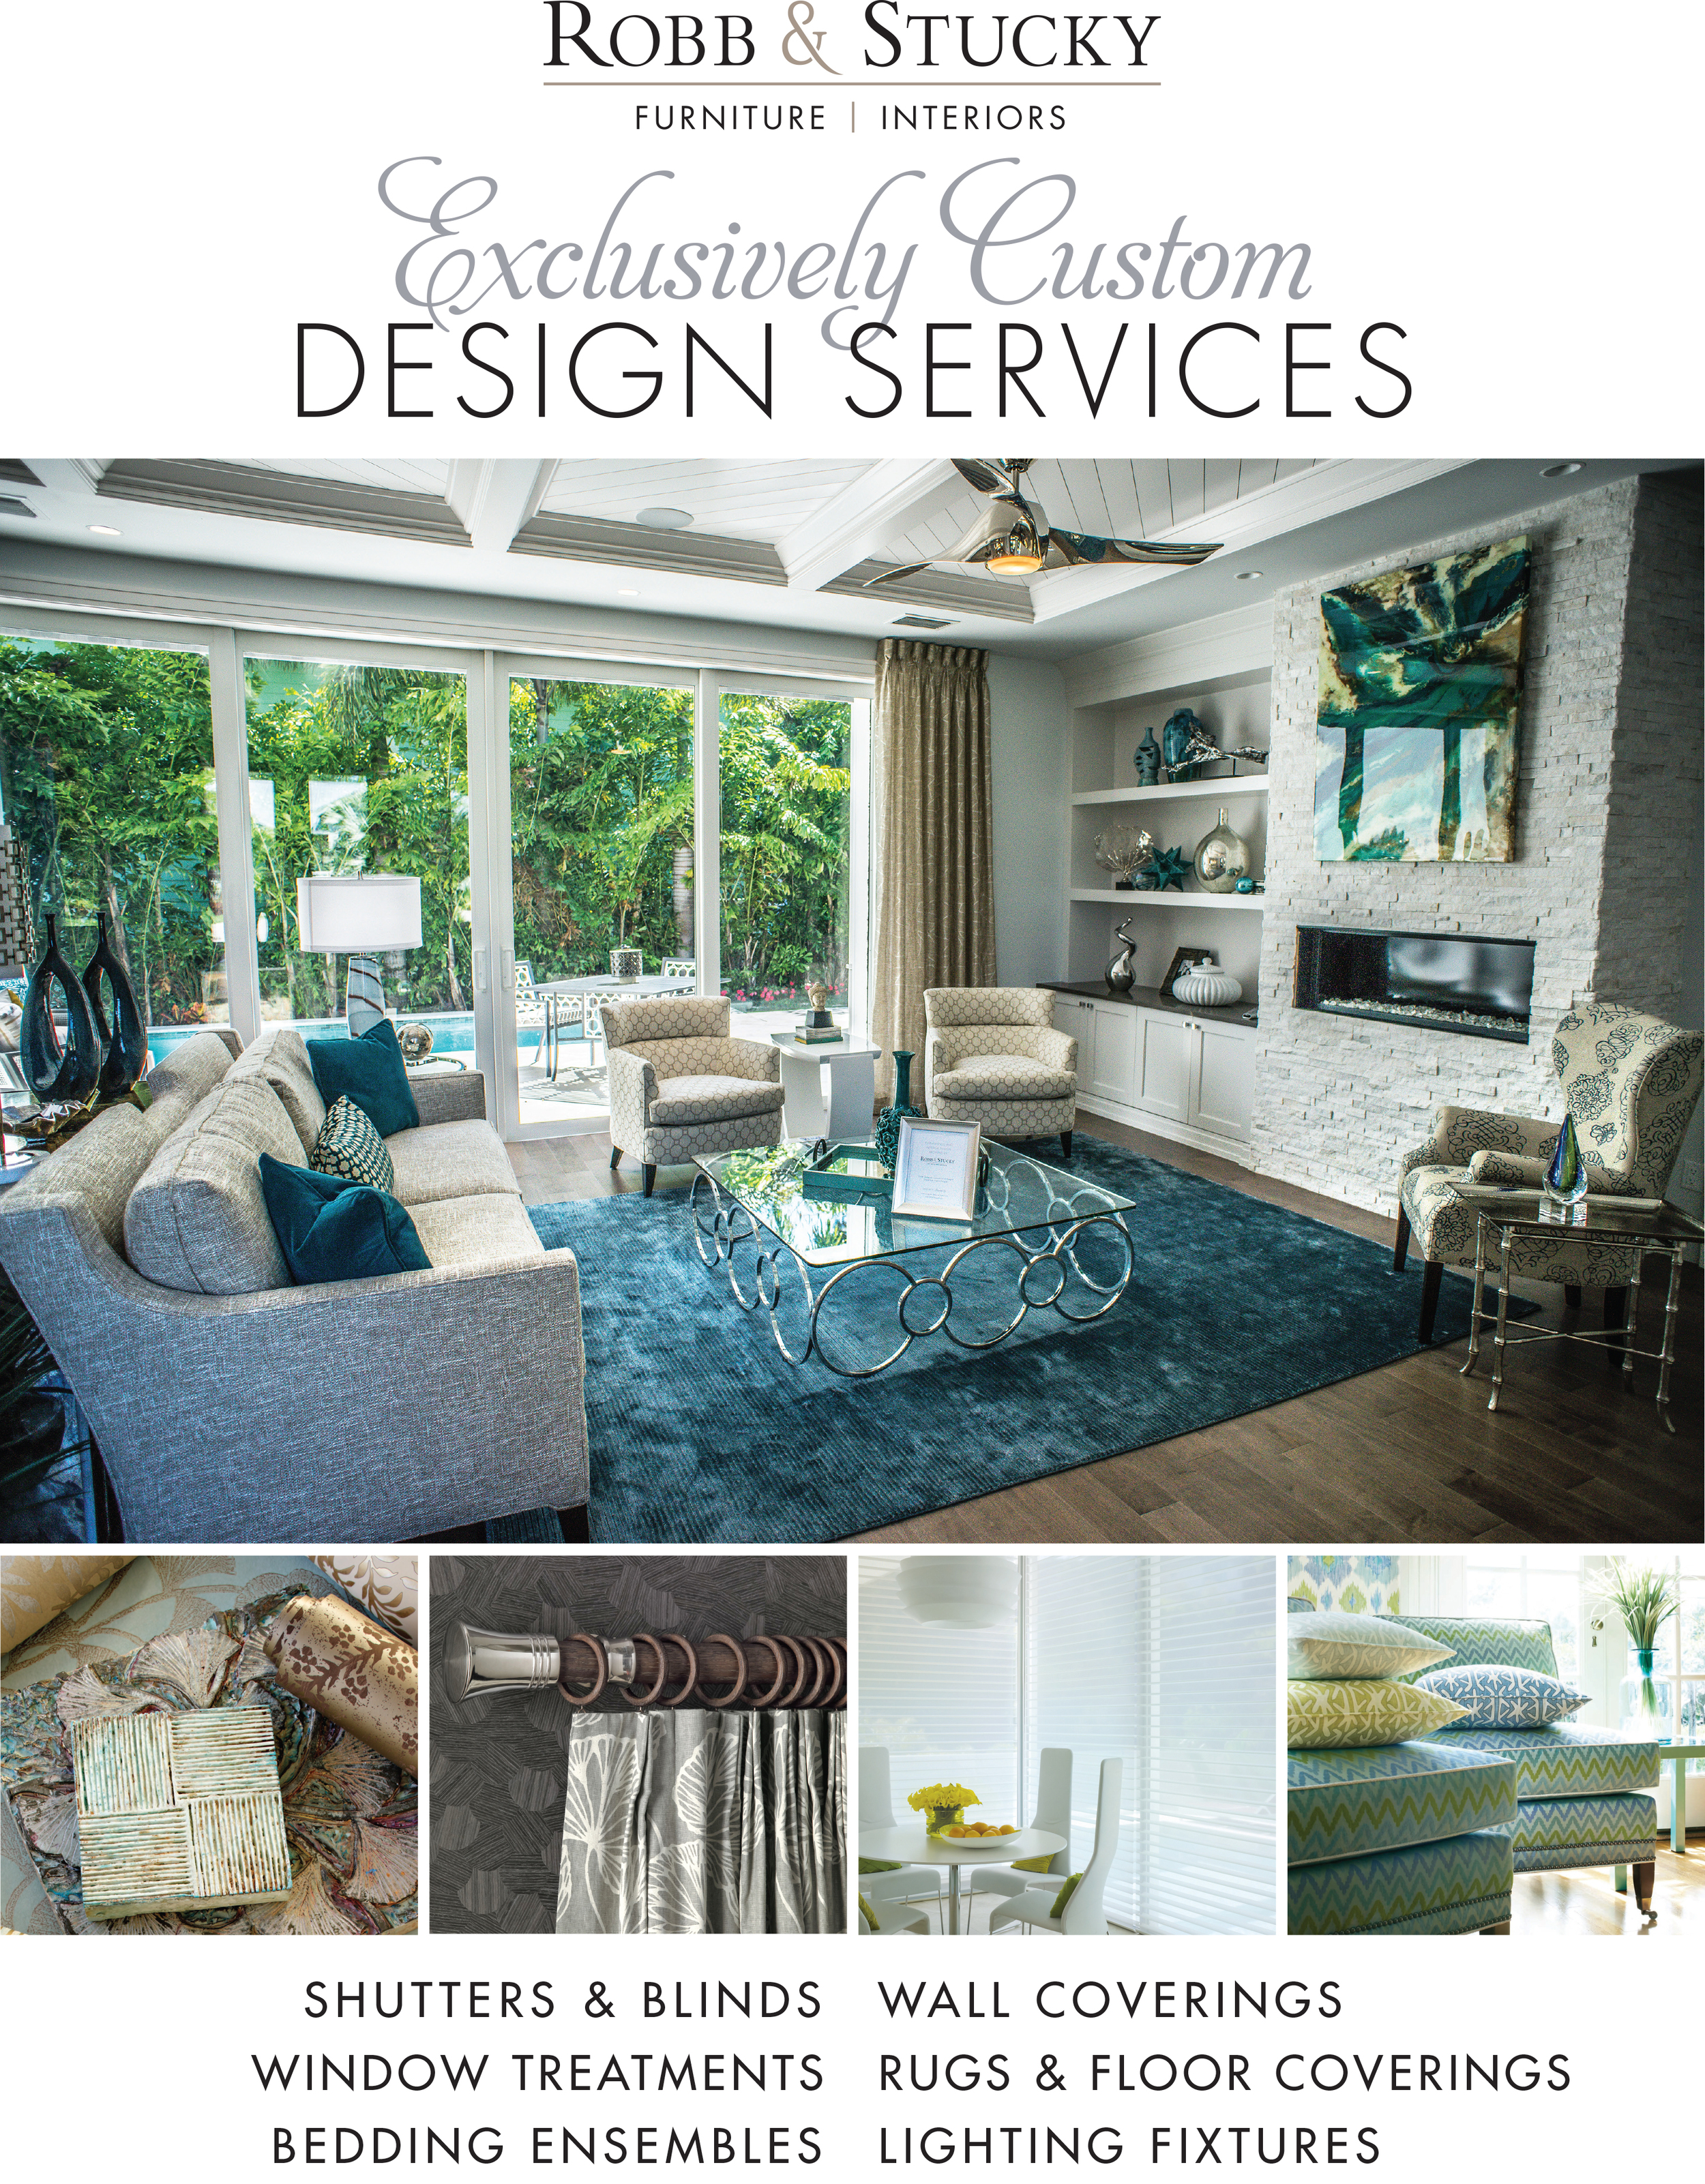 Custom_design_servi#1C6C544.jpg